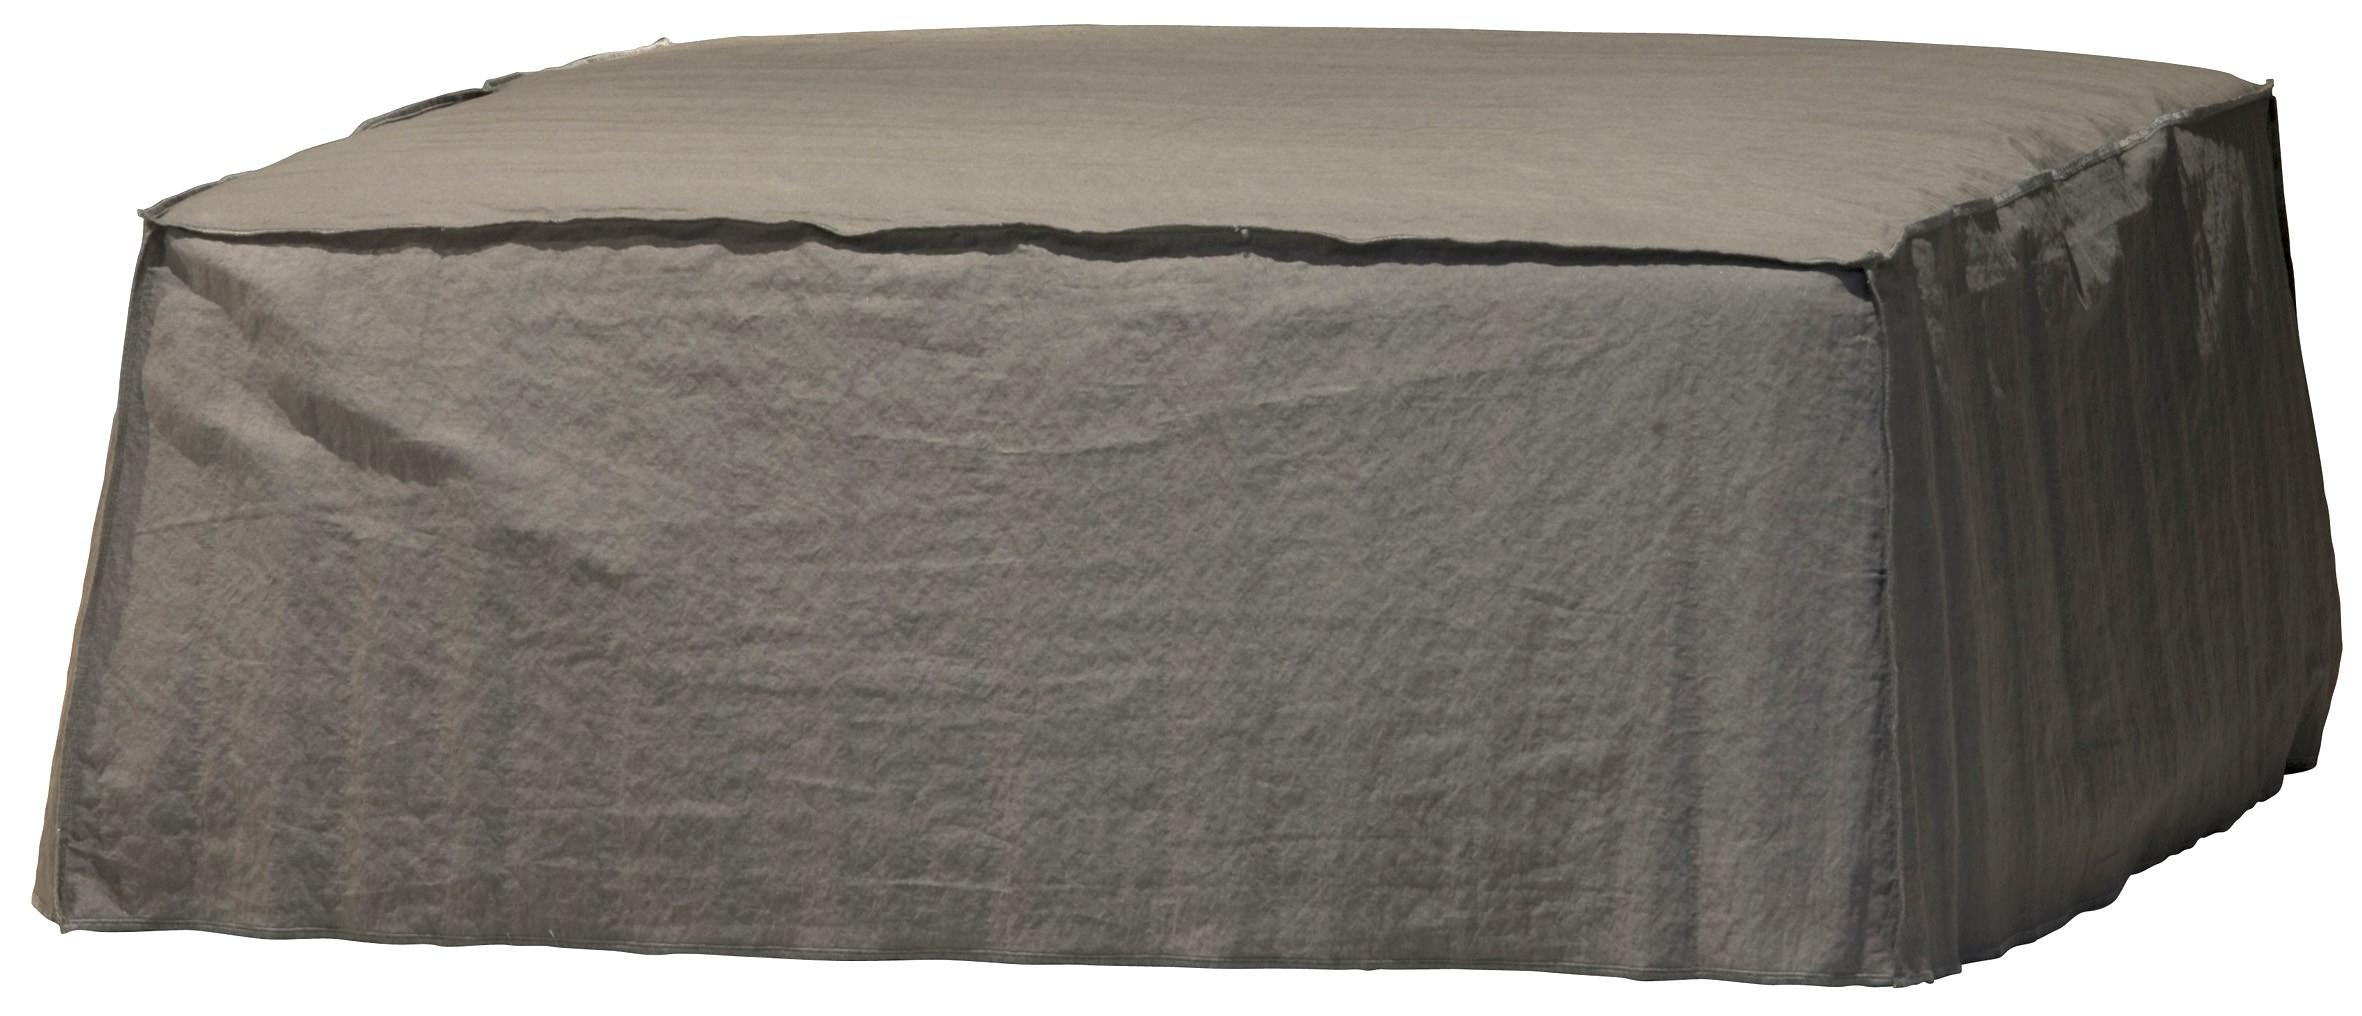 gervasoni pouf de la collection ghost. Black Bedroom Furniture Sets. Home Design Ideas